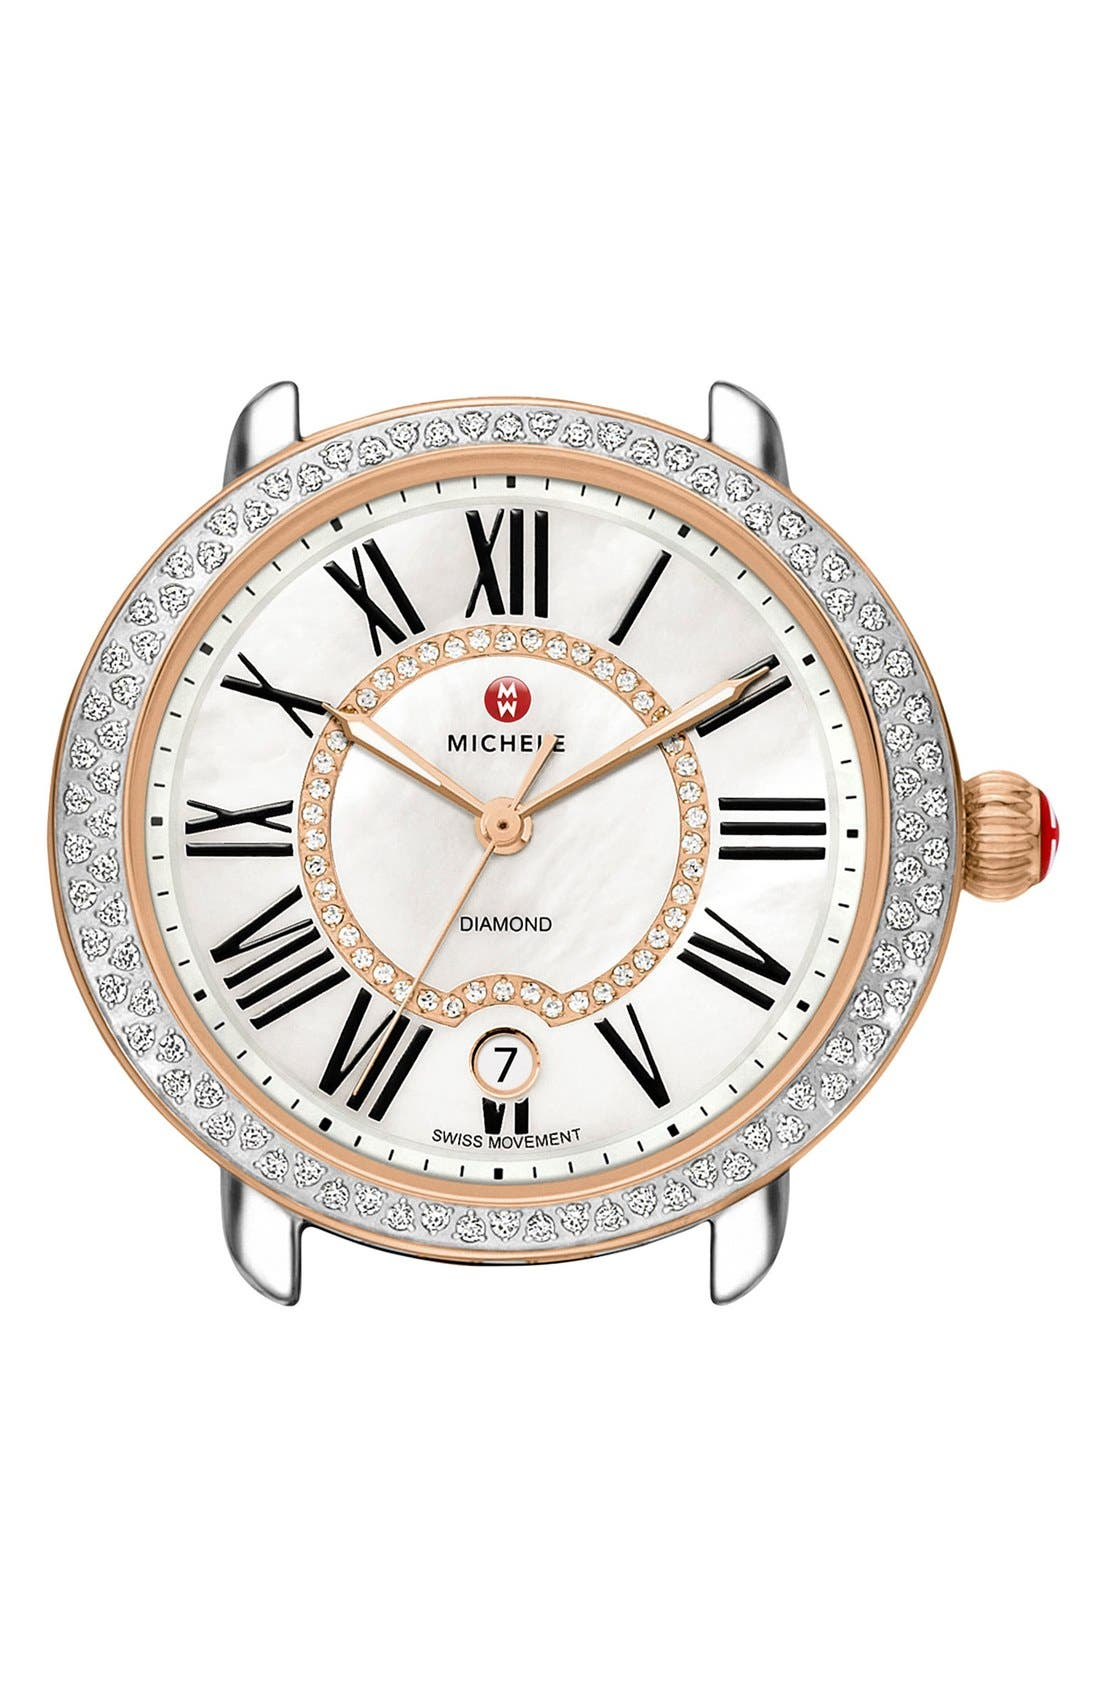 MICHELE Serein 16 Diamond Rose Gold Plated Watch Case, 34mm x 36mm